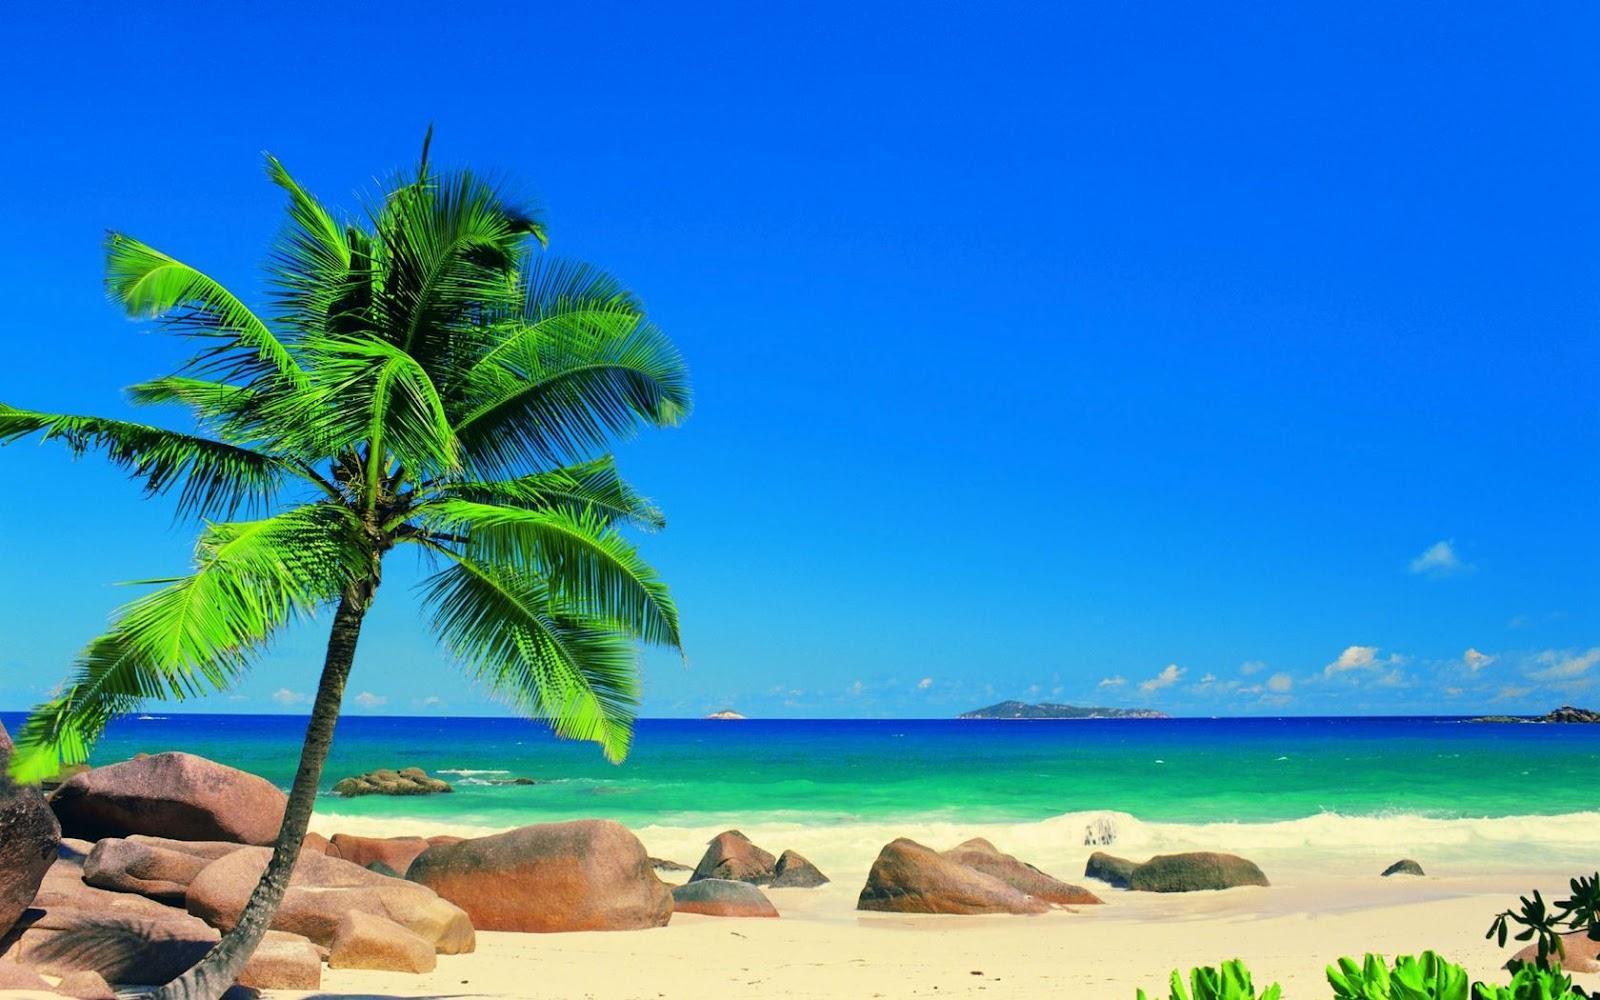 http://4.bp.blogspot.com/-aKk5jY-64yU/T7vJxFbG2uI/AAAAAAAAdgg/O2g8Yau-i2g/s1600/Playas_Isla-Seychelles_Paisajes-Naturales_04.jpg